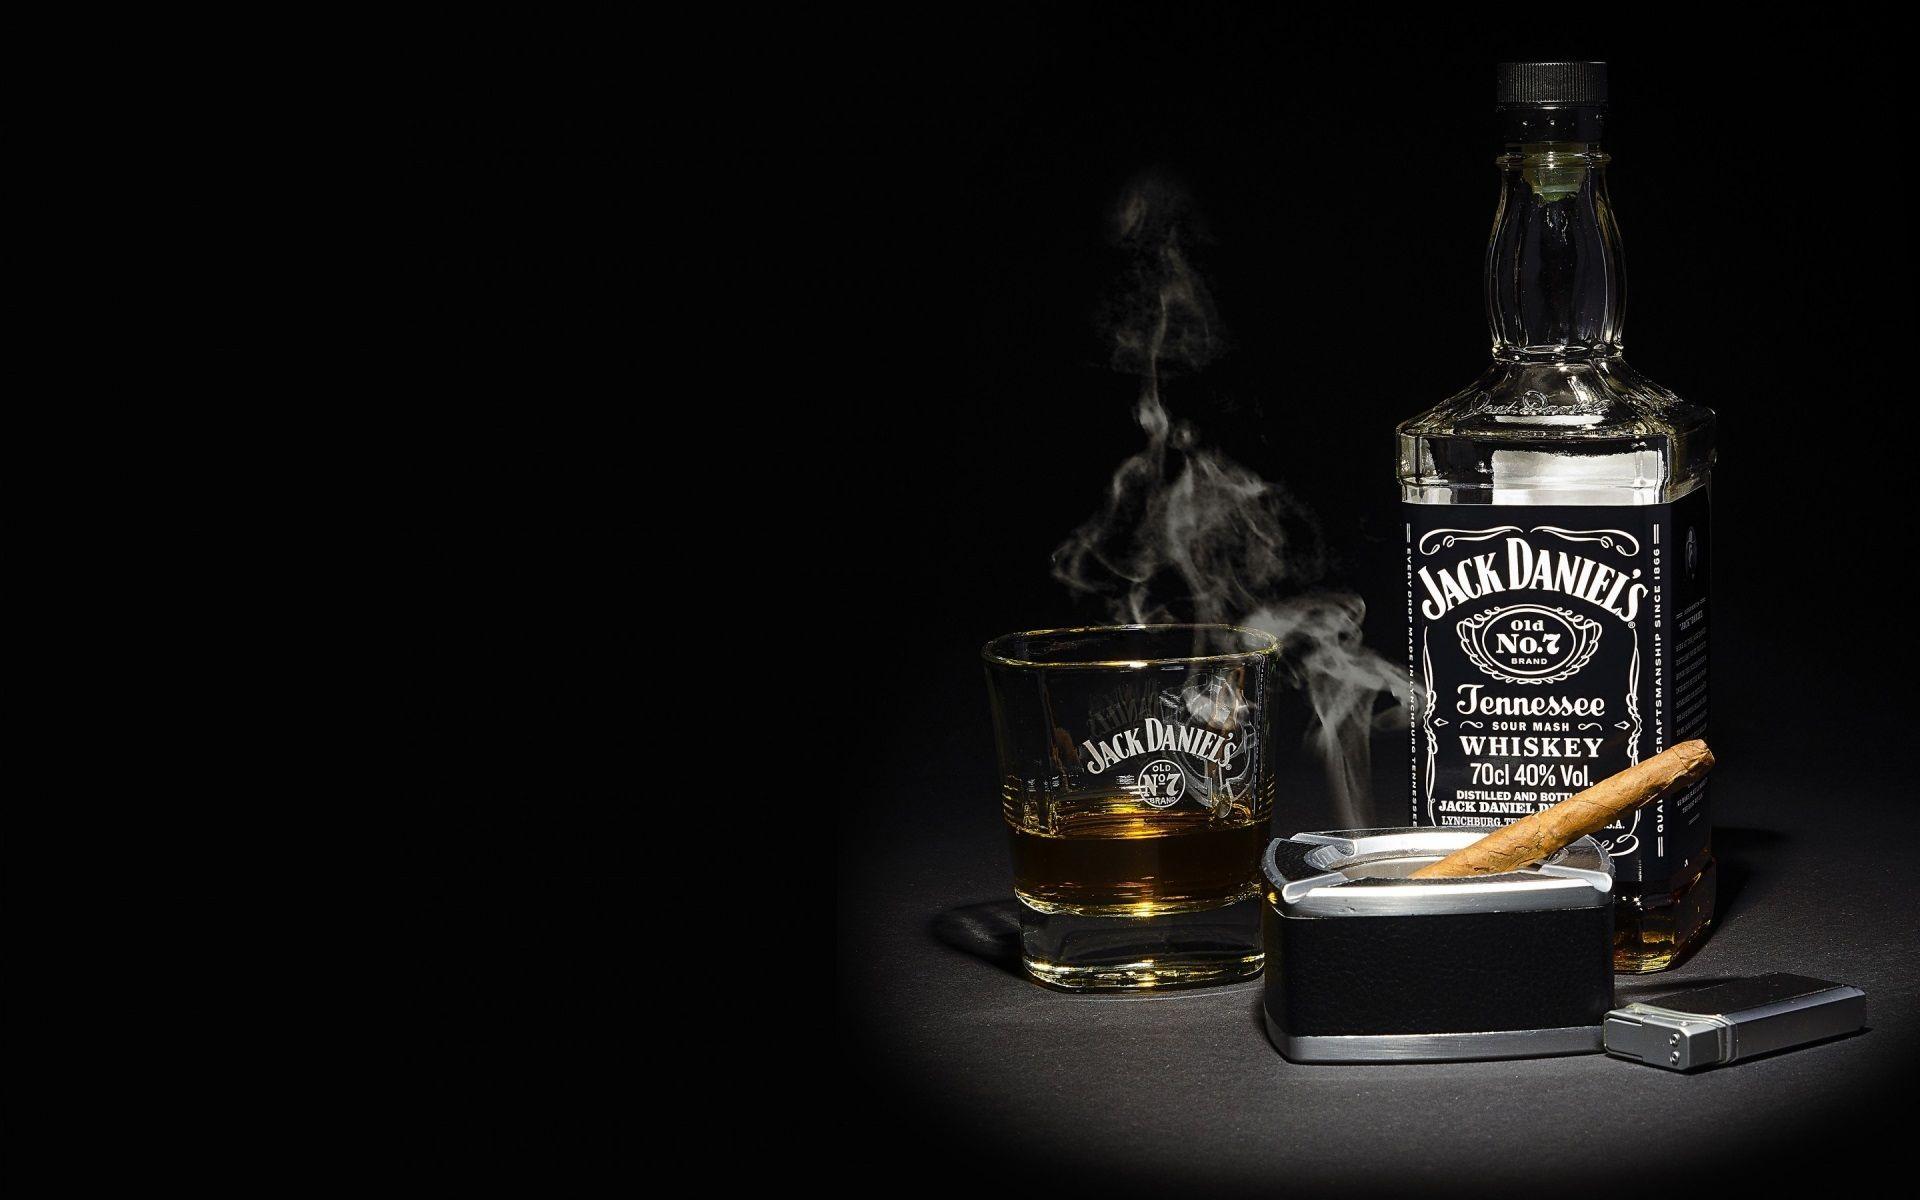 Новогодние, картинки с виски джек дэниэлс